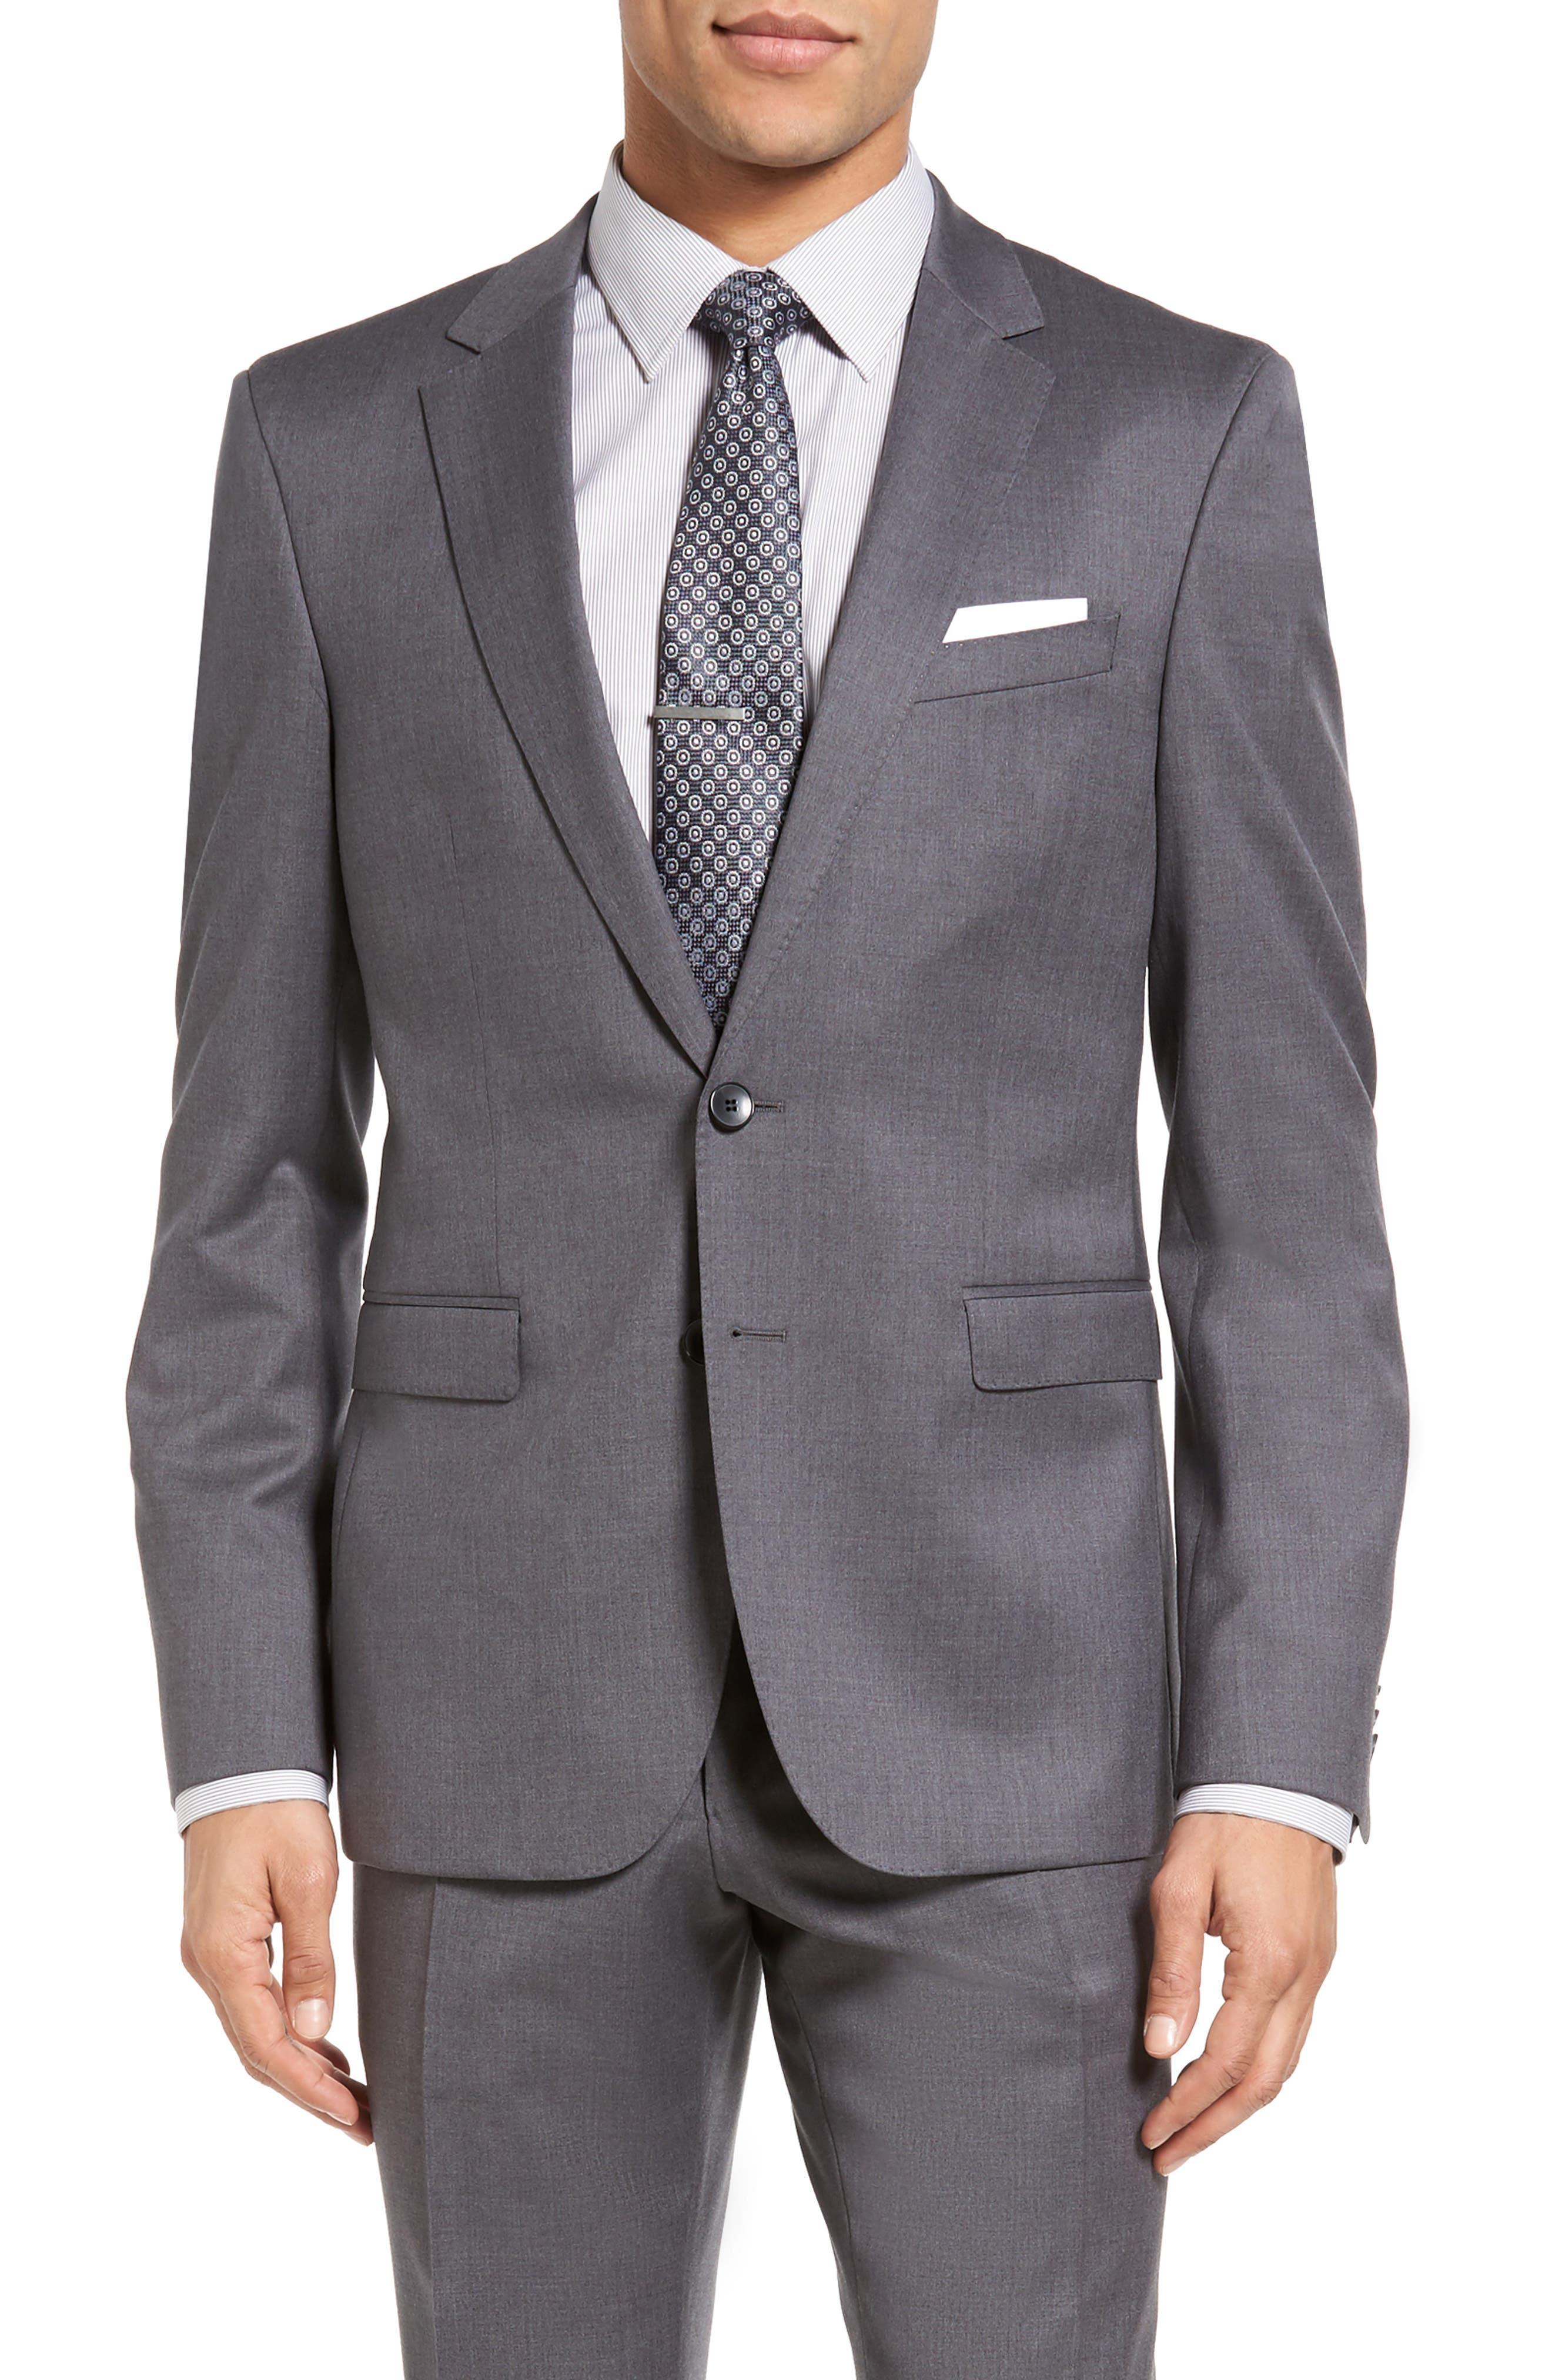 Ryan/Win Trim Fit Solid Wool Suit,                             Alternate thumbnail 2, color,                             Medium Grey